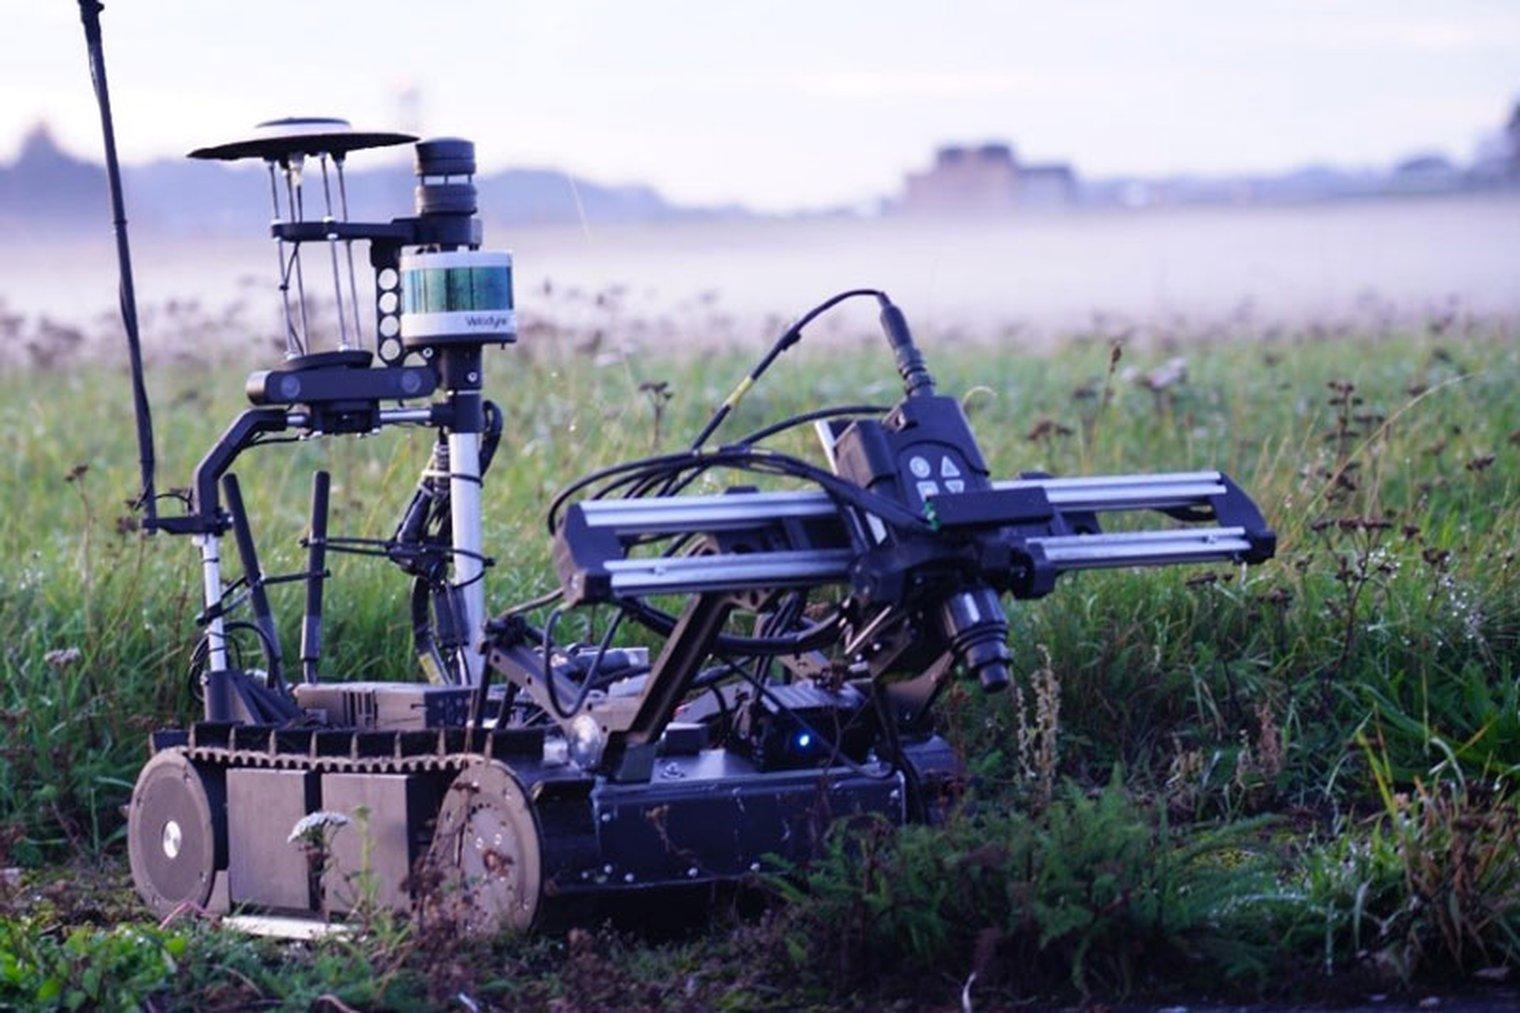 shephardmedia.com - Flavia Camargos Pereira in London - PREMIUM: UK tests robot for chemical reconnaissance - Land Warfare